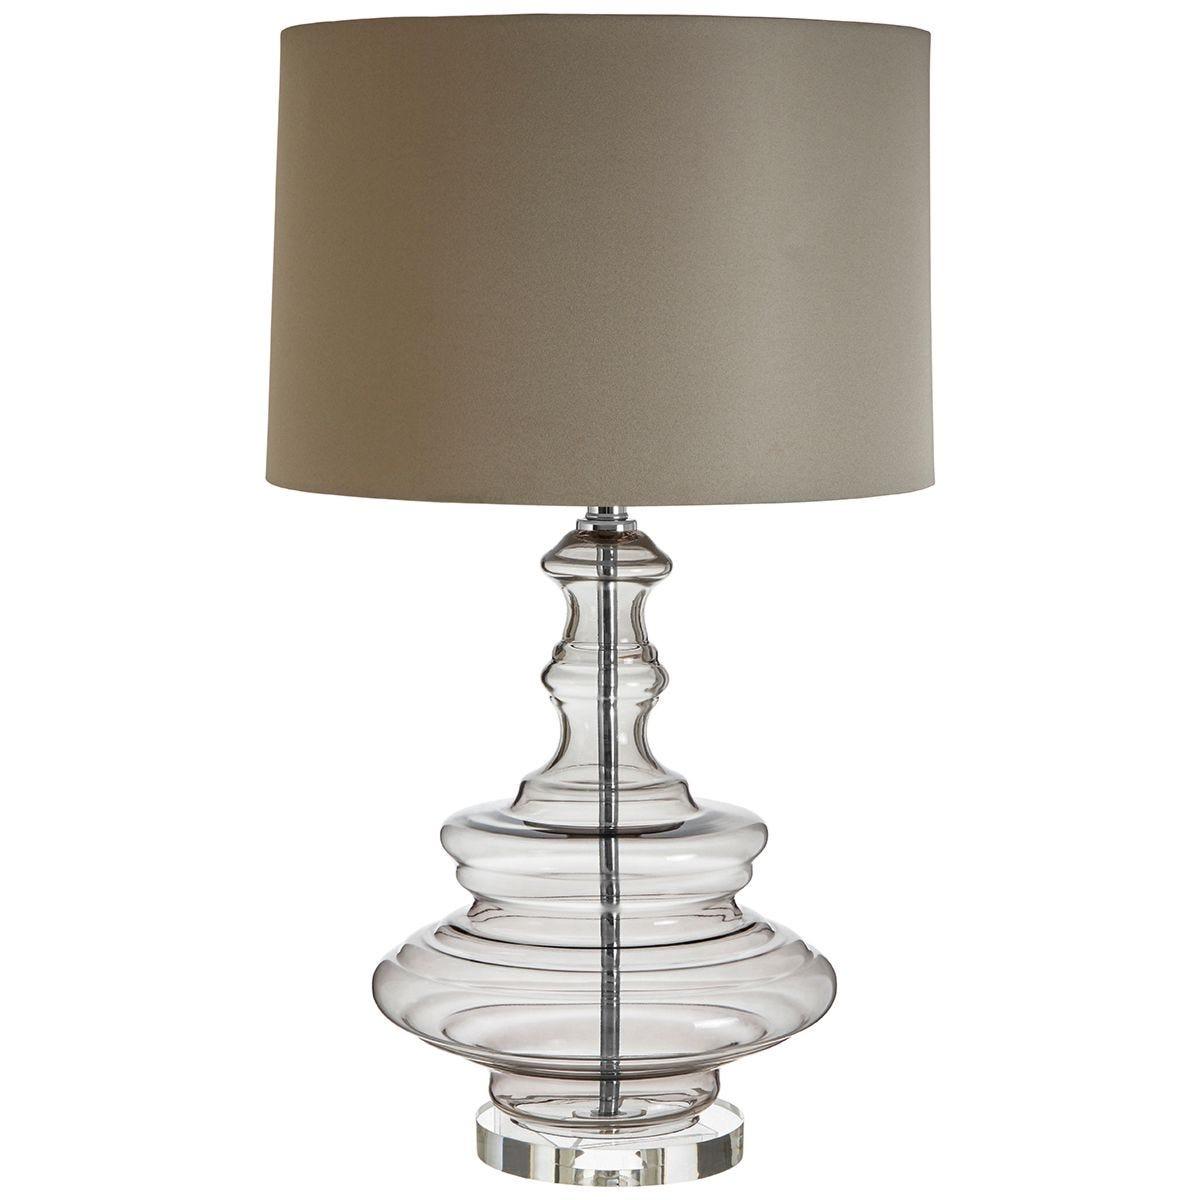 Premier Housewares Urania Table Lamp with Grey Shade